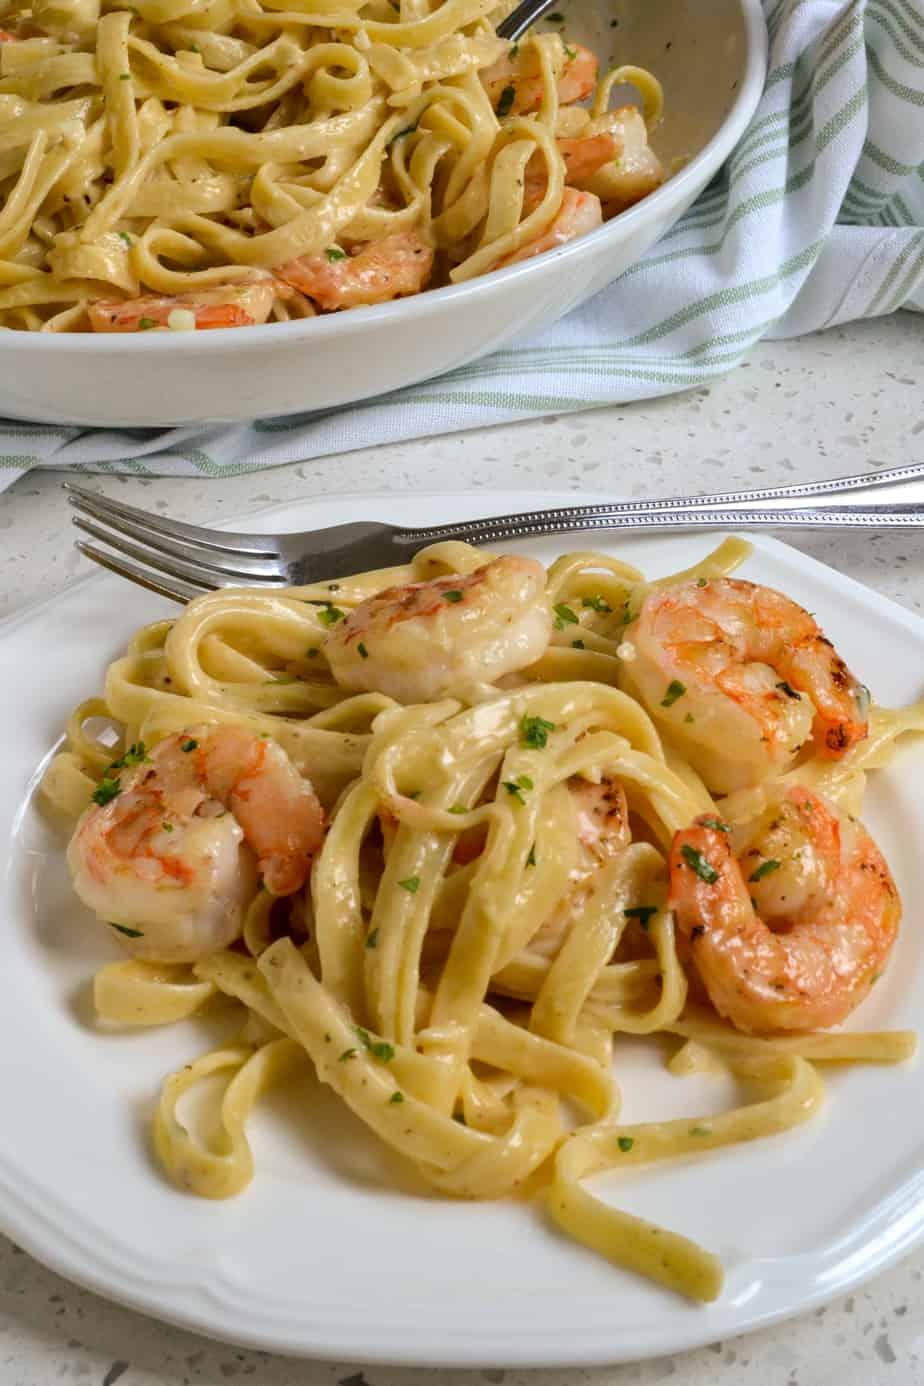 A plate of fettucine alfredo pasta with shrimp